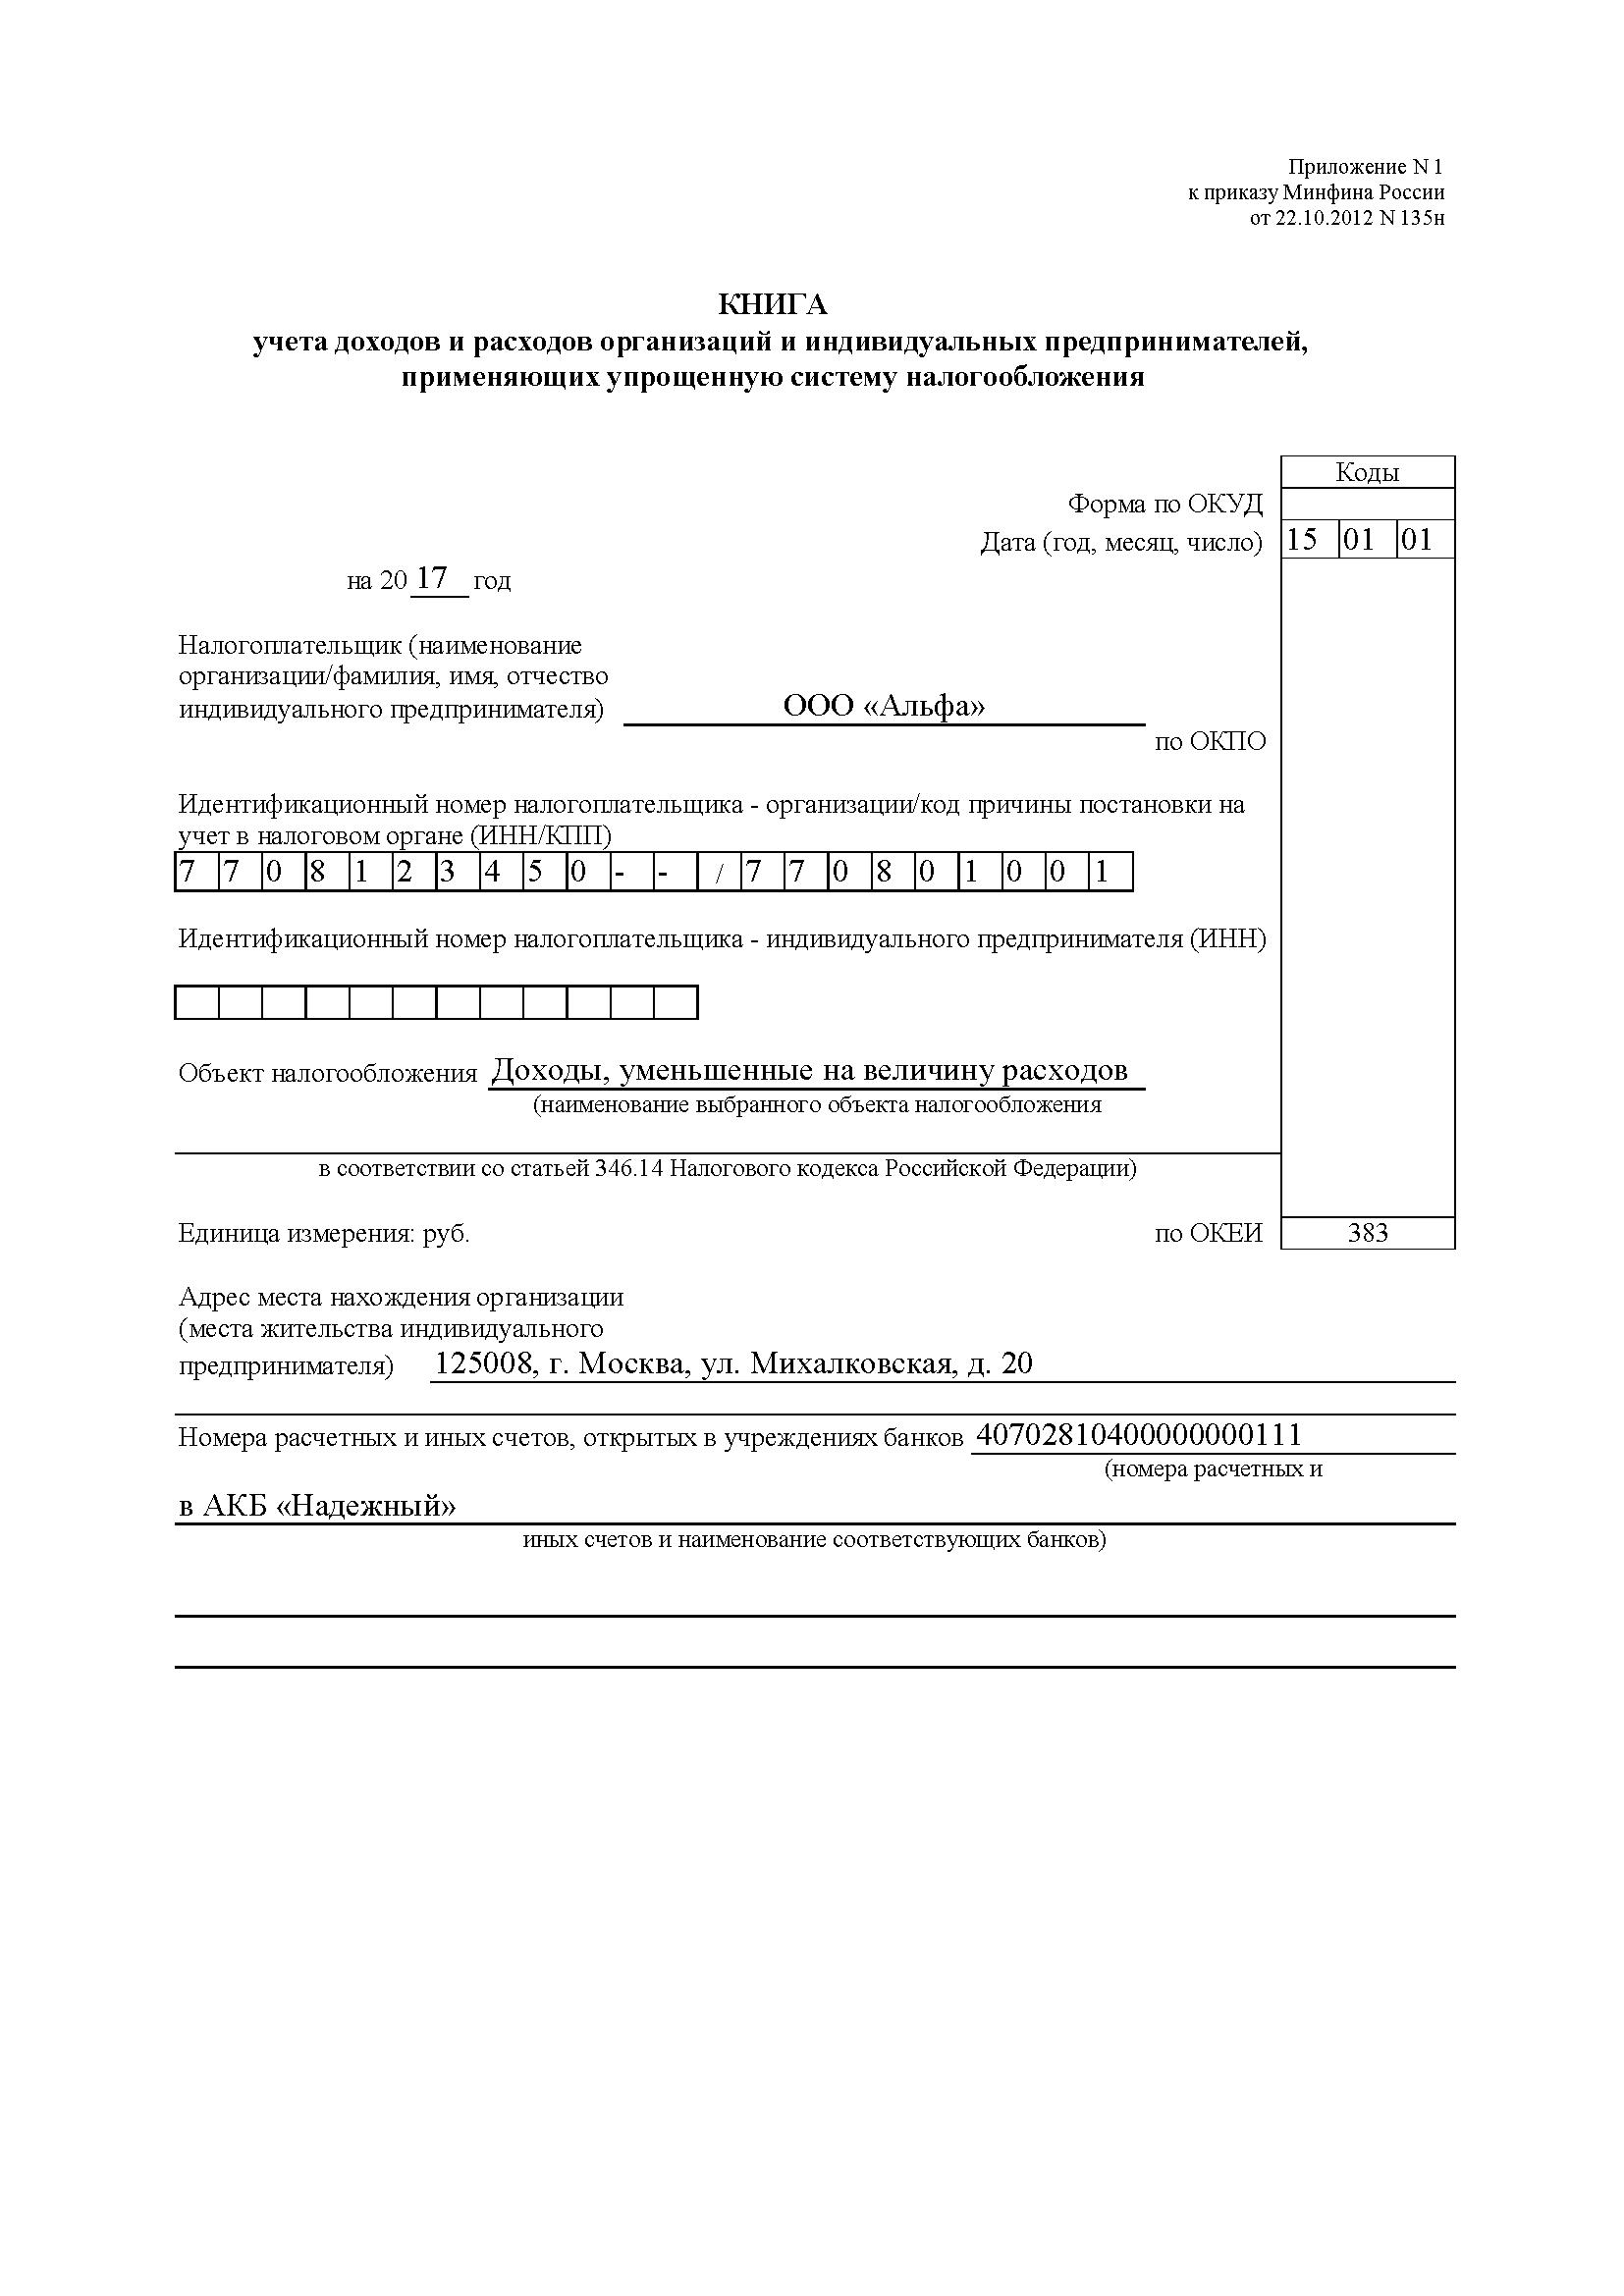 бланк декларации земельного налога за 2010 год